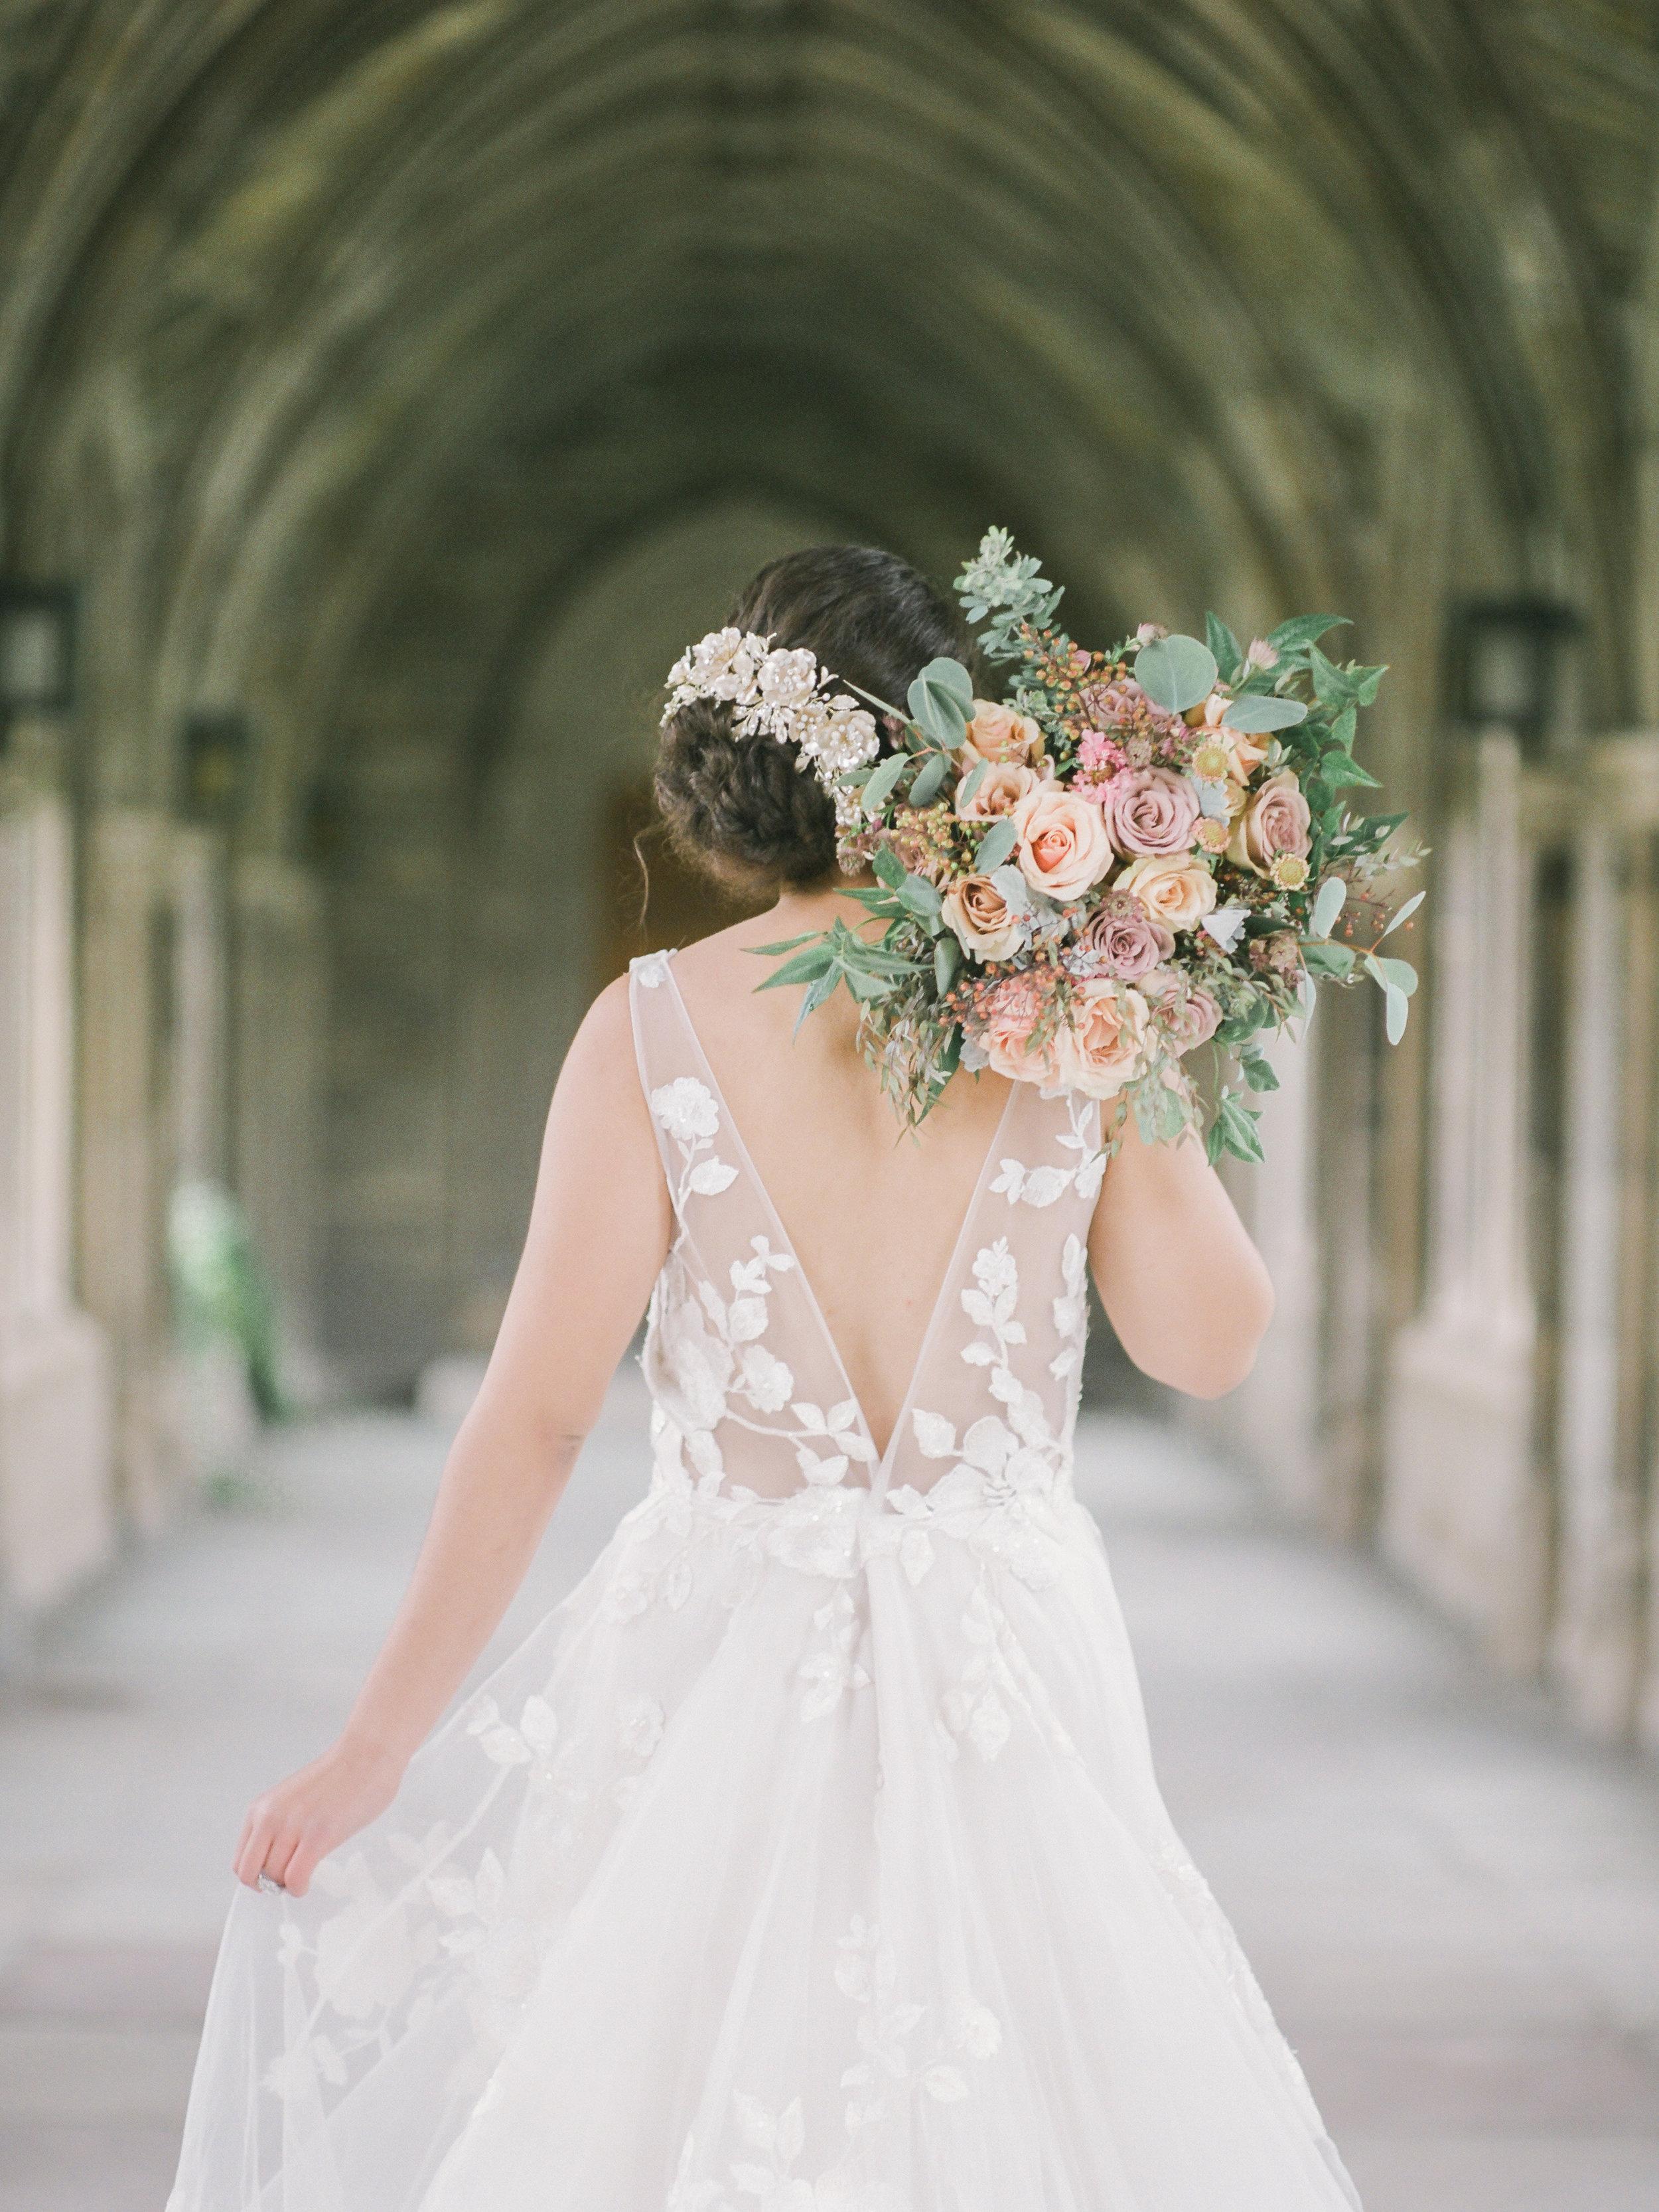 Ithaca New York-Brides Story-Manda Weaver-Wedding-5.jpg